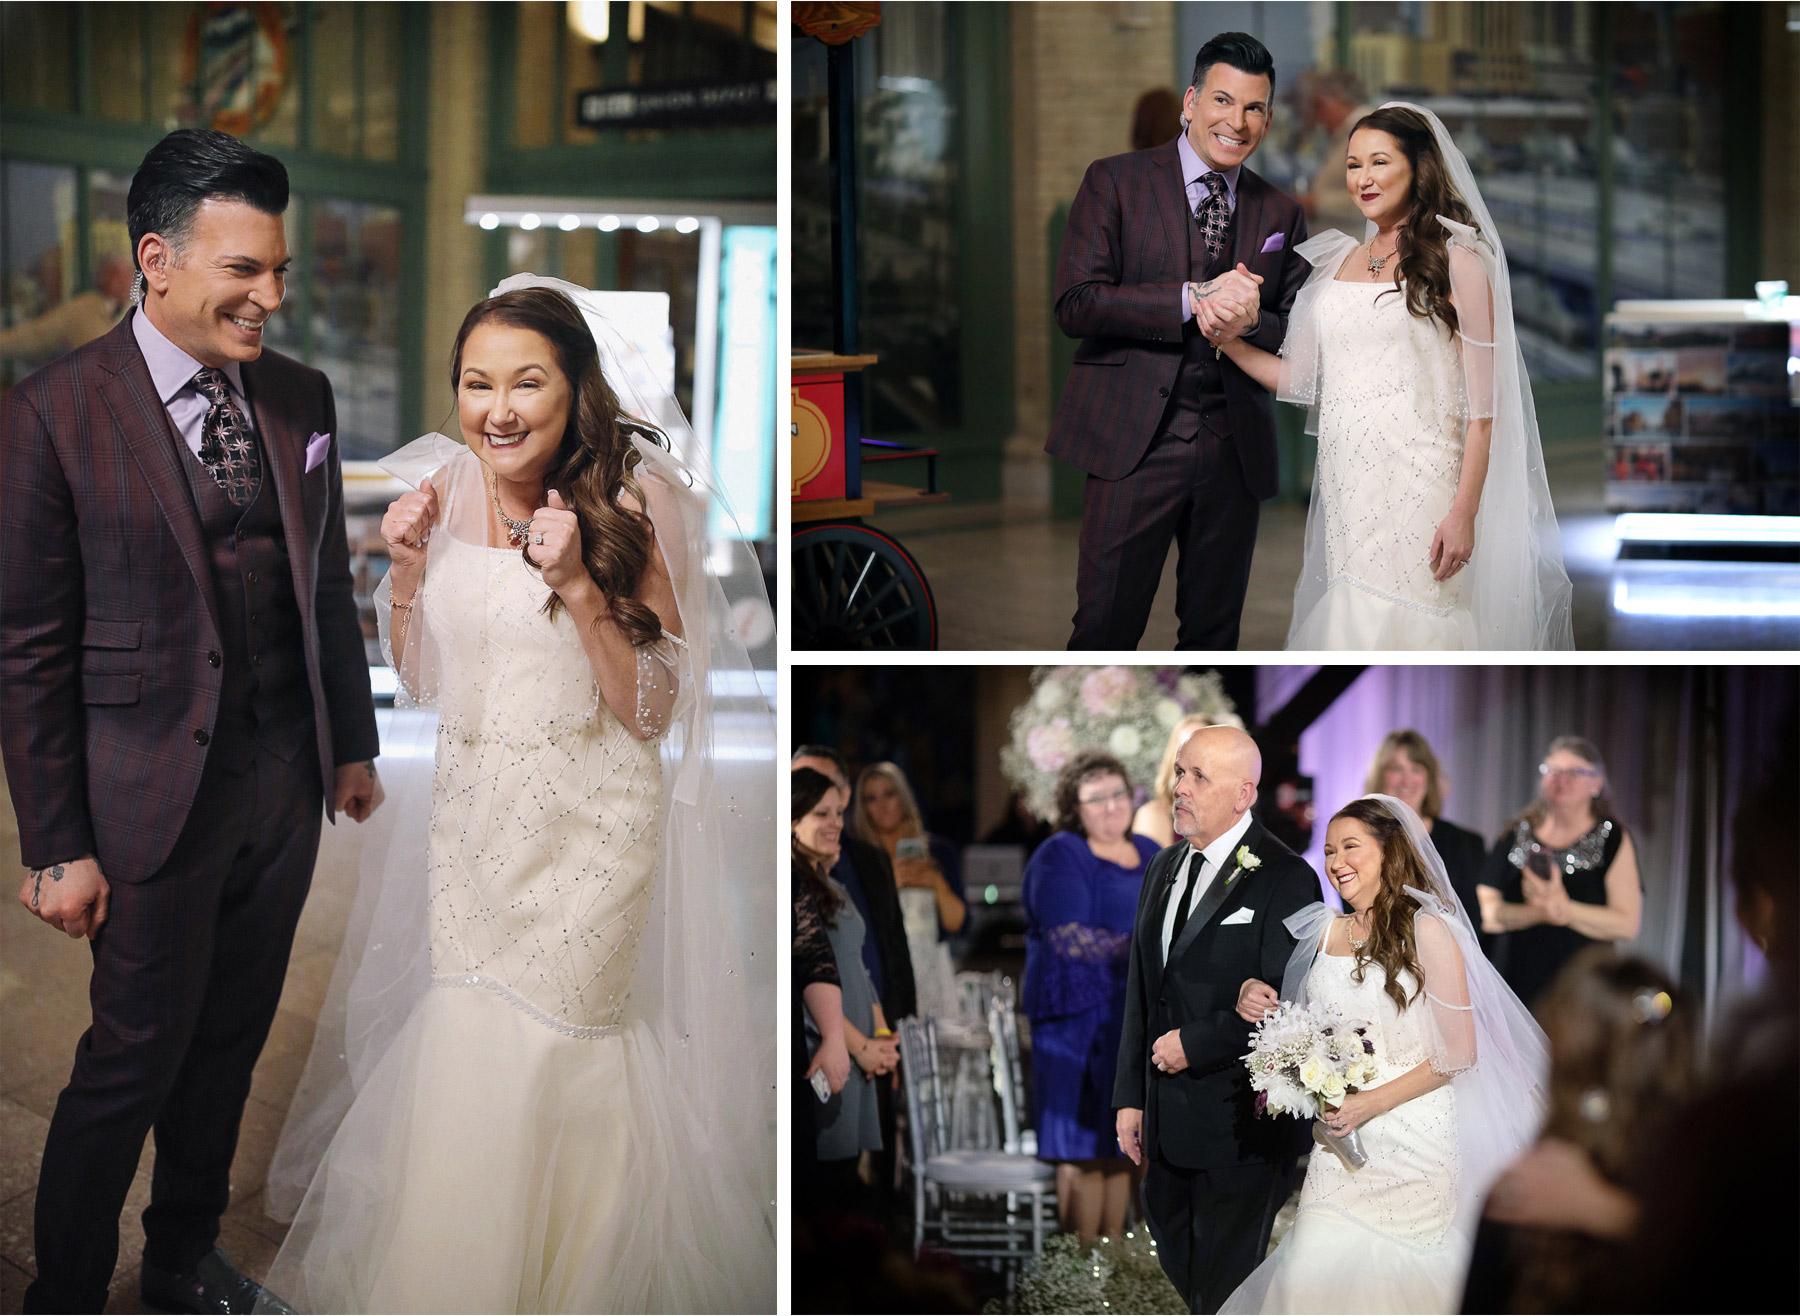 07-Saint-Paul-Minnesota-Wedding-by-Vick-Photography-Union-Depot-Lifetime-Network-David-Tutera-My-Great-Big-Live-Wedding-Bride-and-Father-Ceremony-Jen-and-Rob.jpg